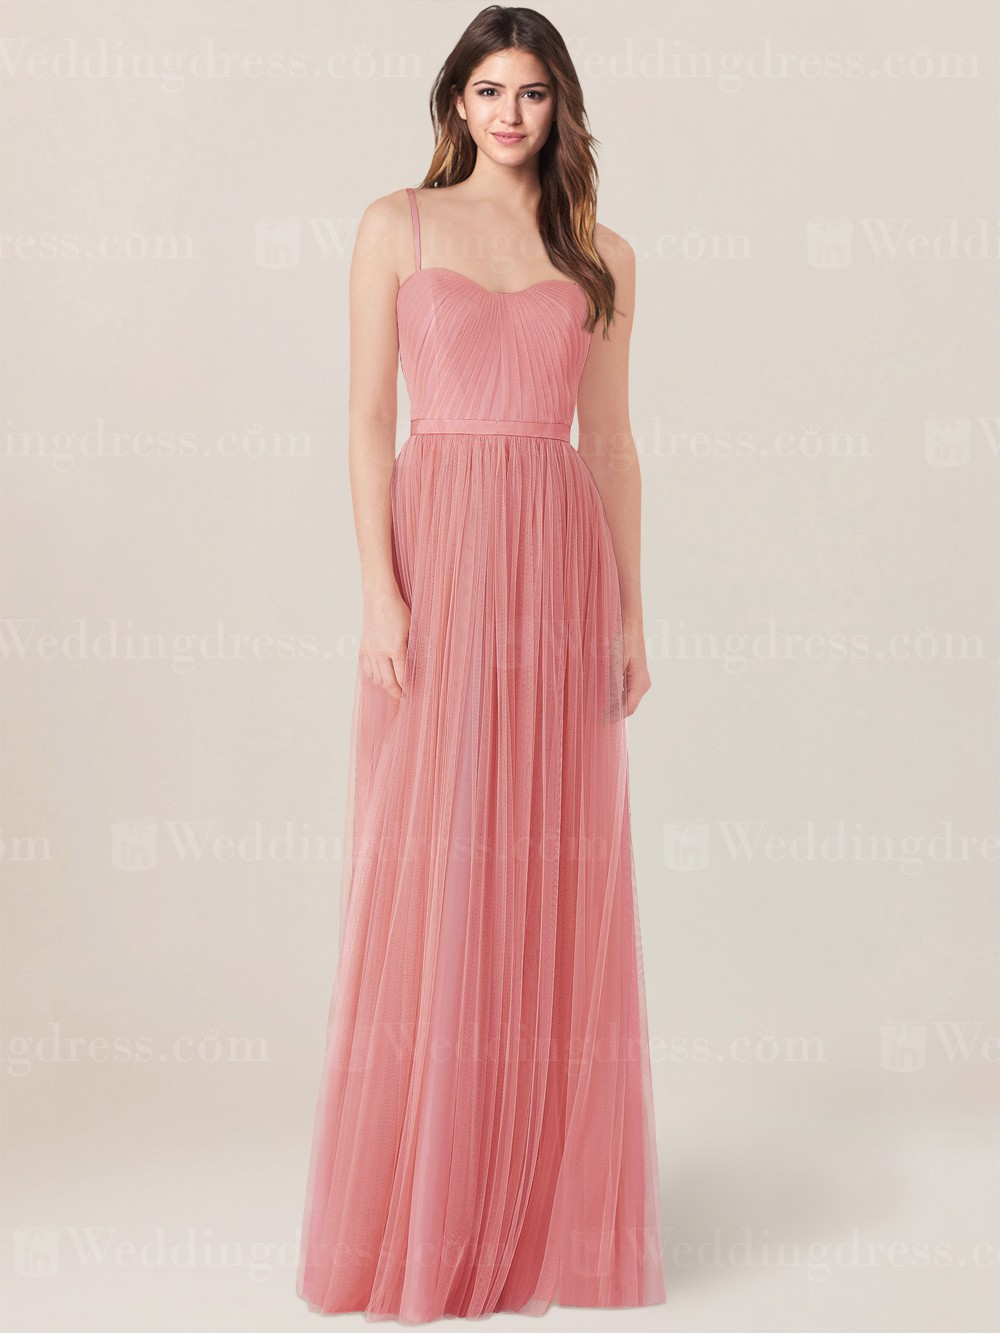 Tulle unique bridesmaid dress 119 ombrellifo Choice Image